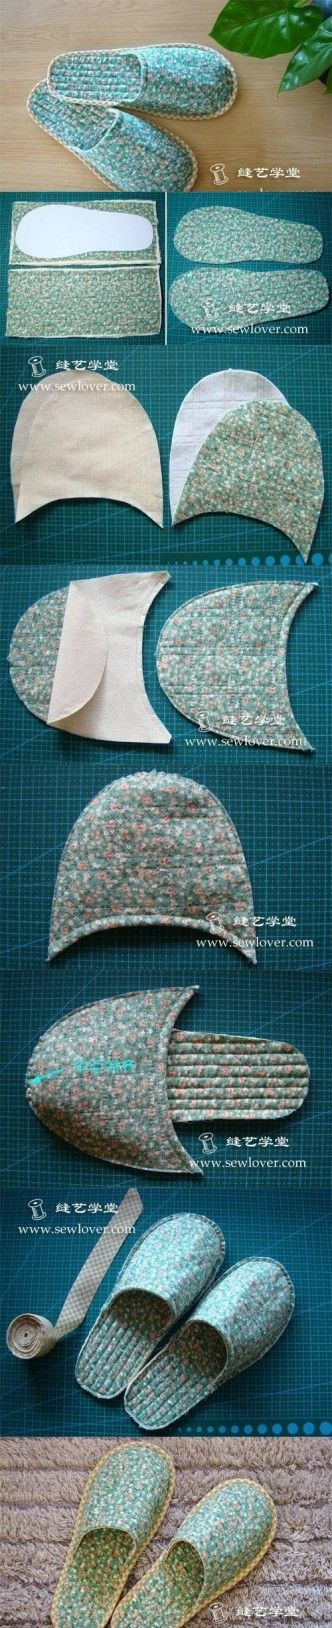 DIY Sew Slipper DIY Projects llll